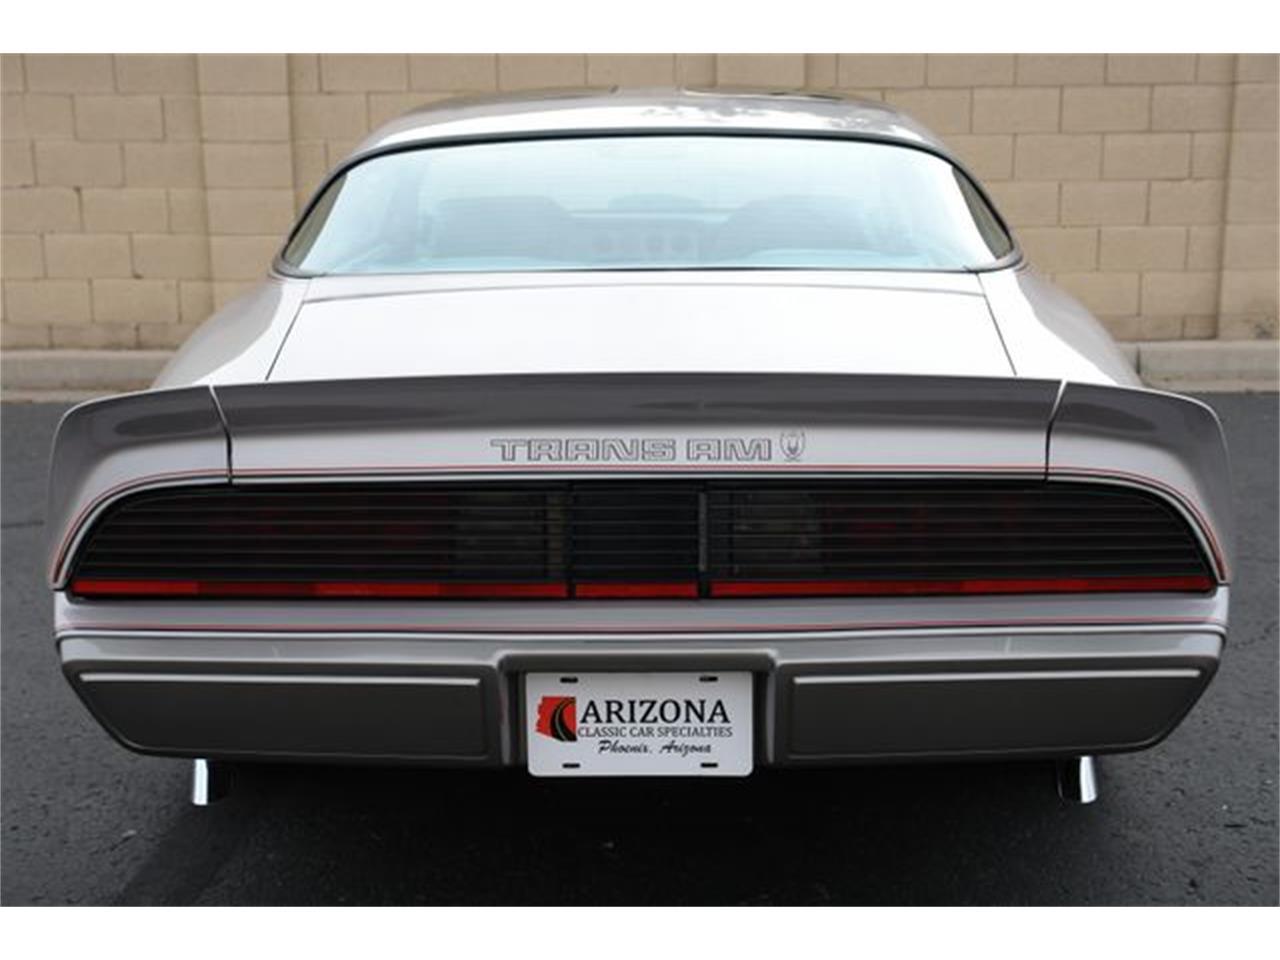 1979 Pontiac Firebird Trans Am (CC-1220992) for sale in Phoenix, Arizona